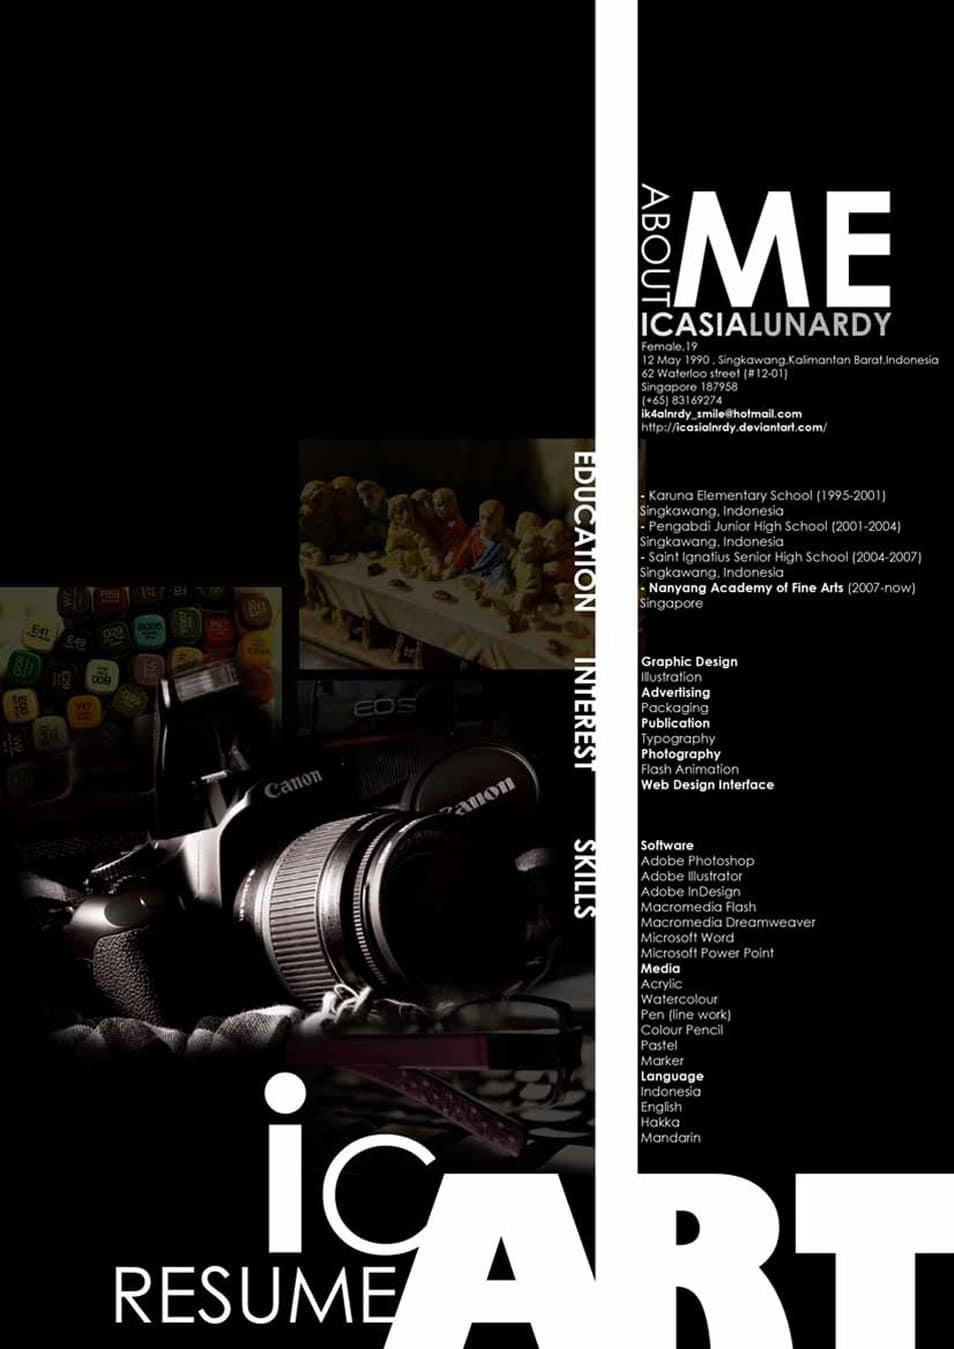 Book Cover Design Internship : Creative cv resume design inspiration